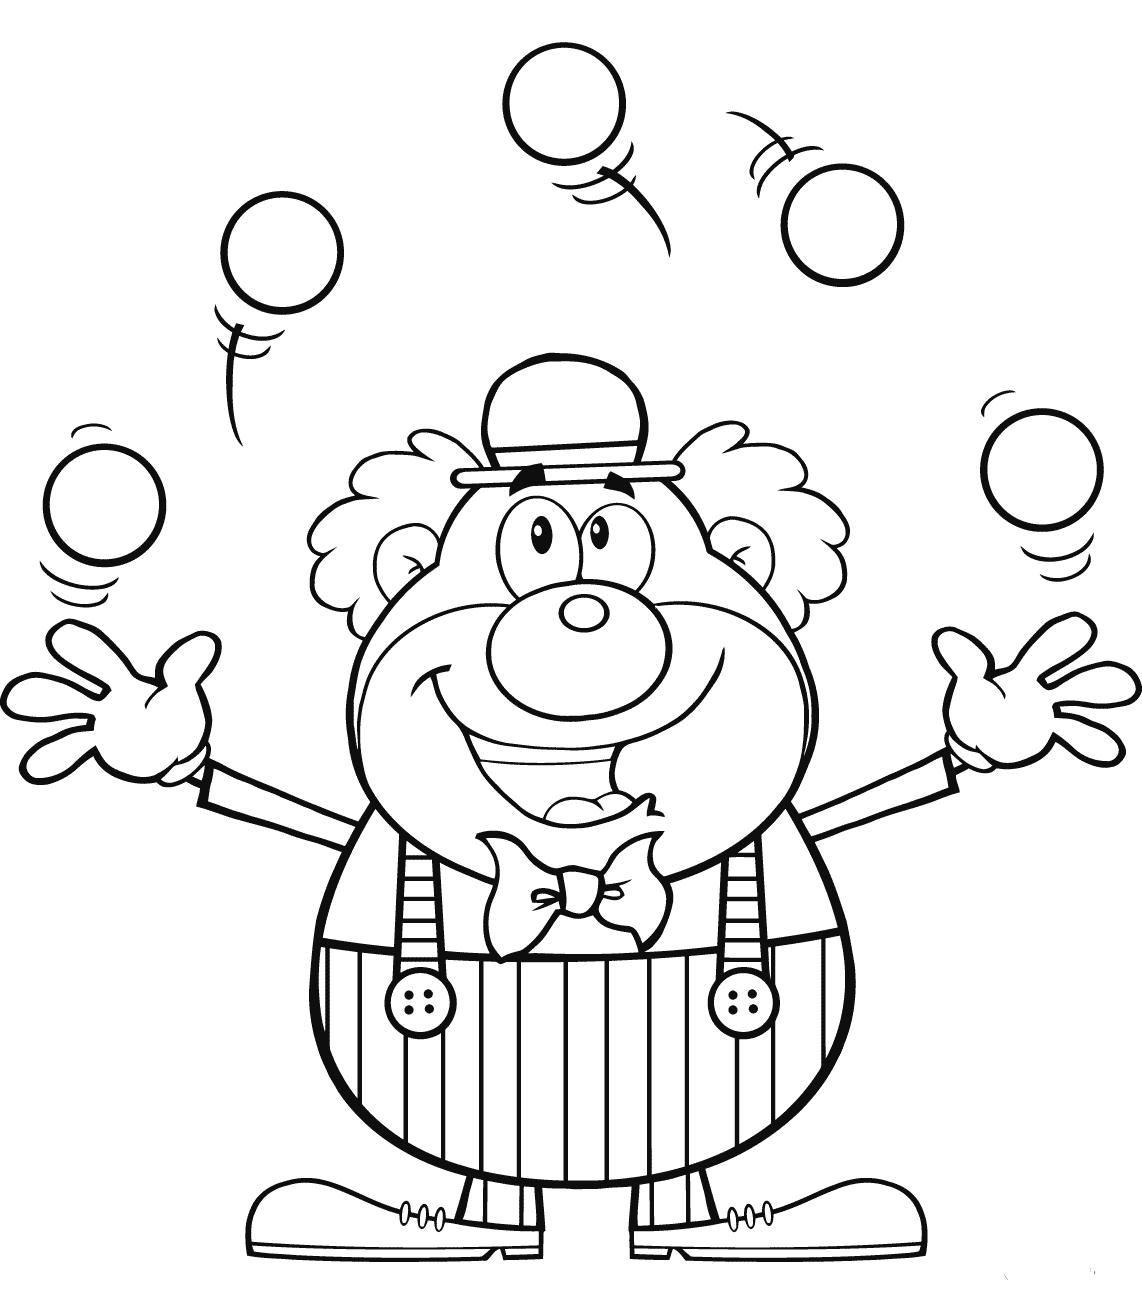 Clown Juggling Balls Coloring Page